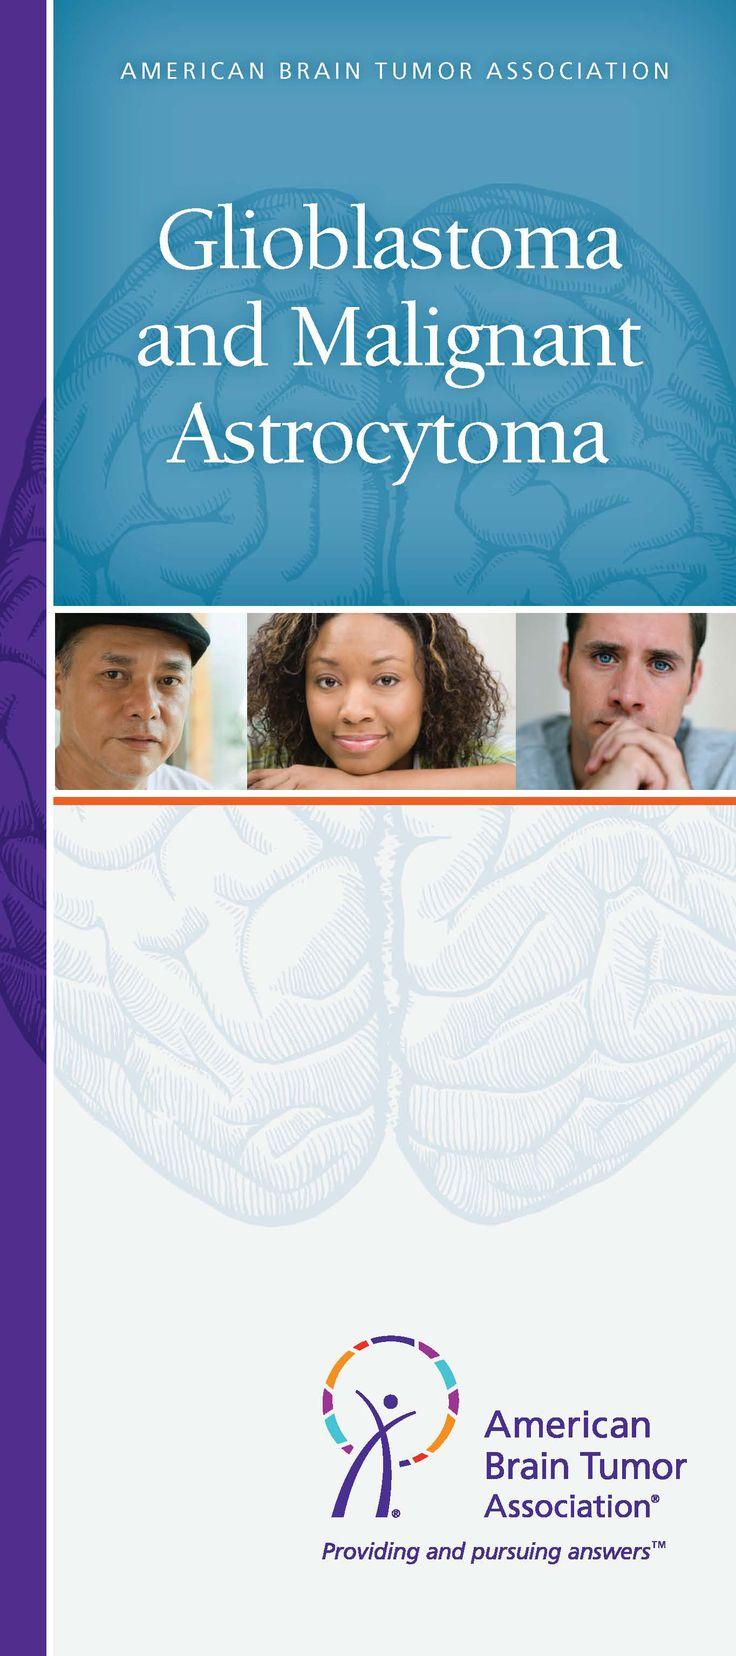 The ABTA's Glioblastoma (GBM) Publication